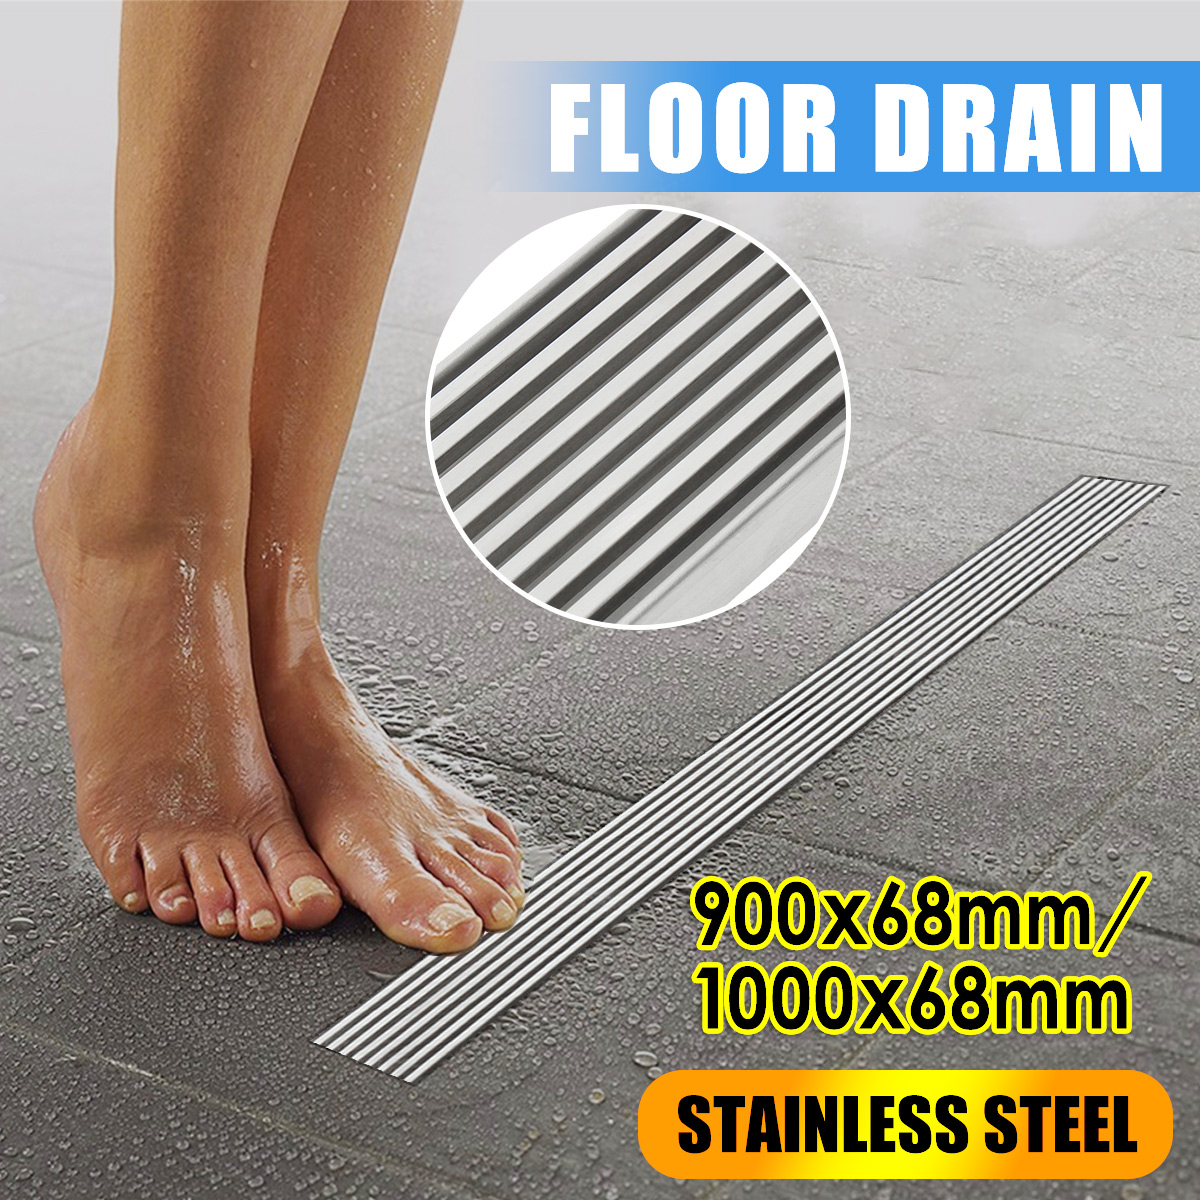 цена на 900/1000mm Odor-Resistant Floor Drain Cover Rectangle 304 Stainless Steel Shower Floor Grate Drain Linear Waste Bathroom Shower